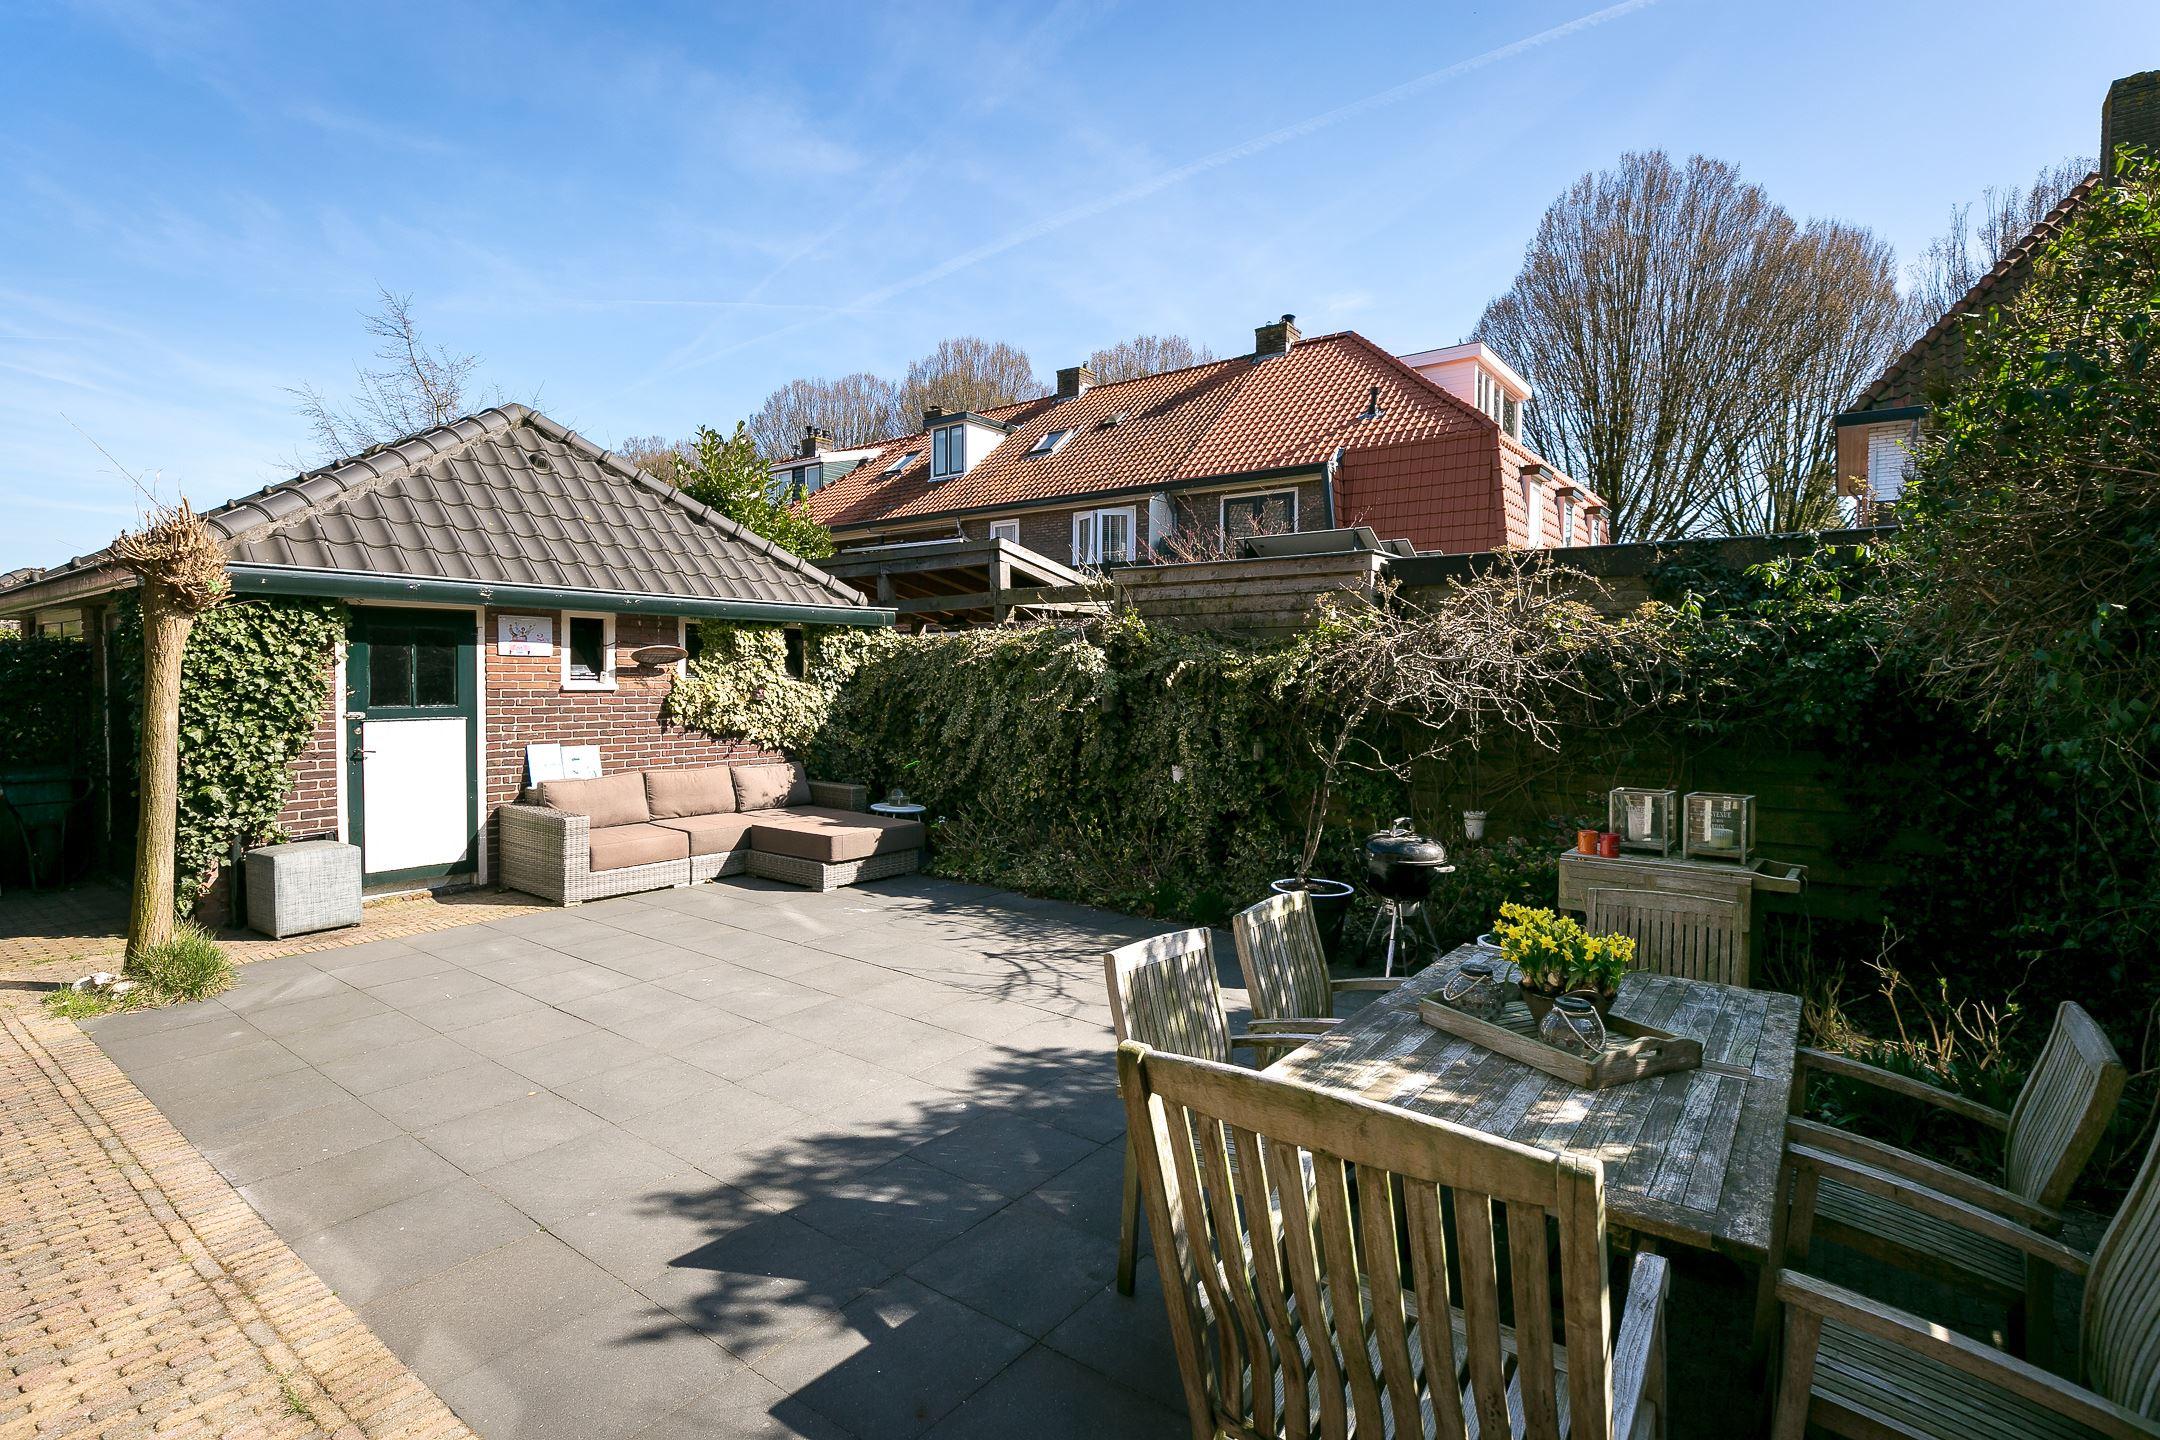 Huis te koop johannes geradtsweg 59 1222 pm hilversum funda for Huis hilversum